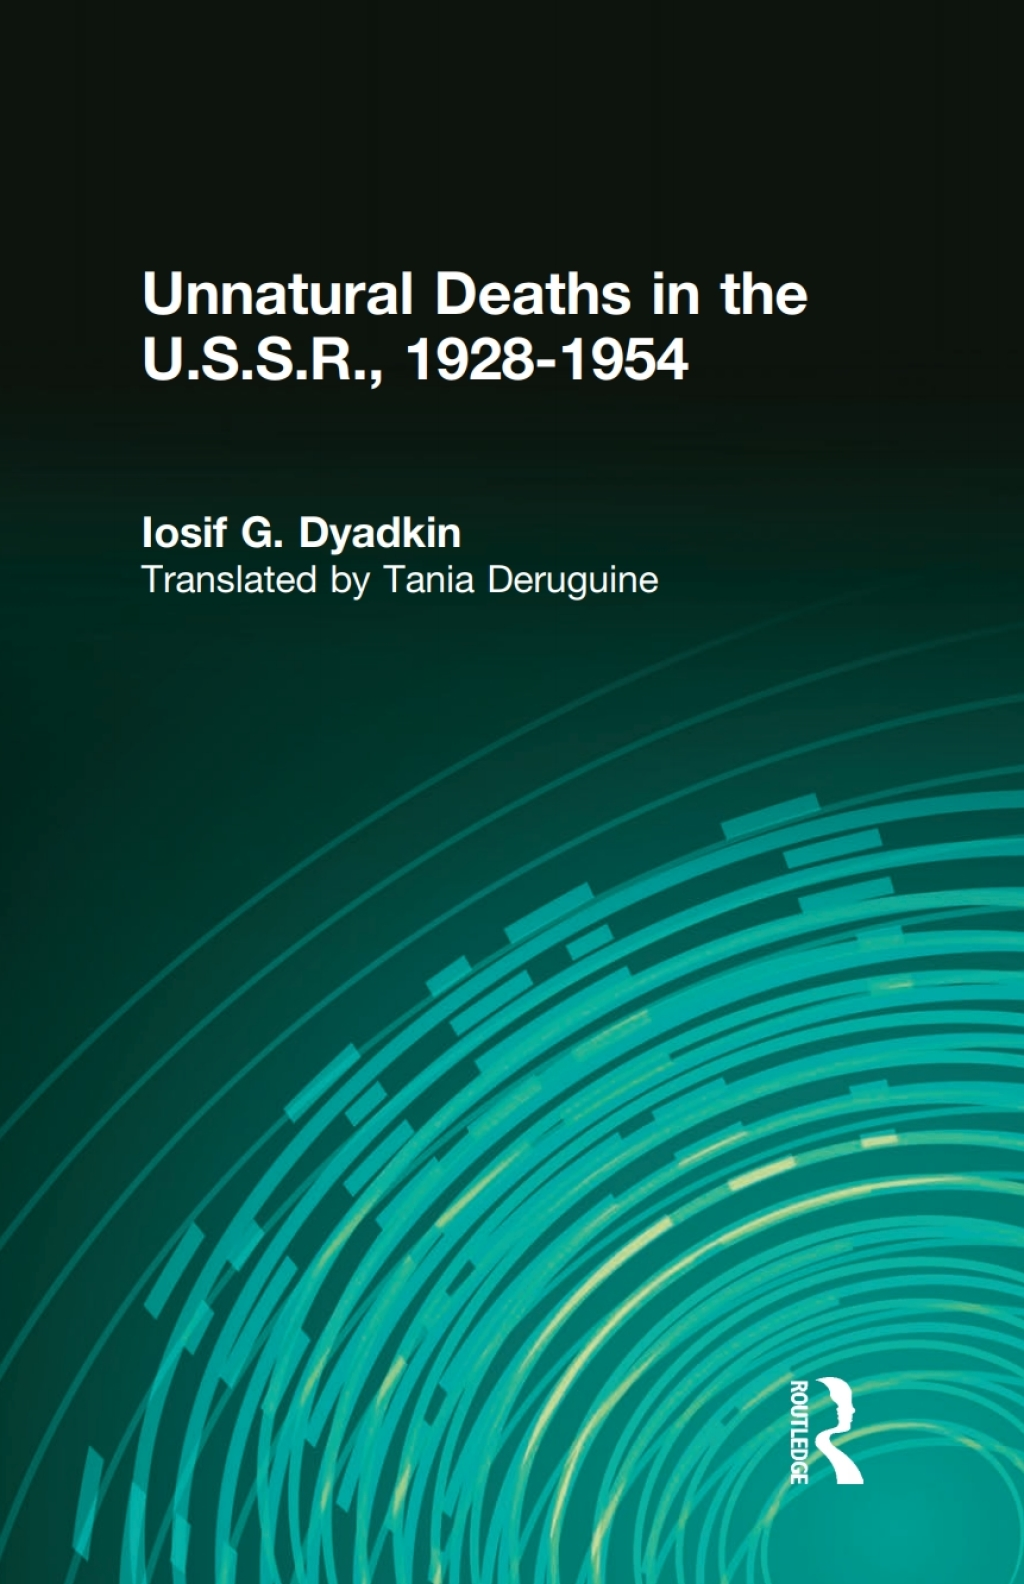 Unnatural Deaths in the U.S.S.R. (eBook Rental)